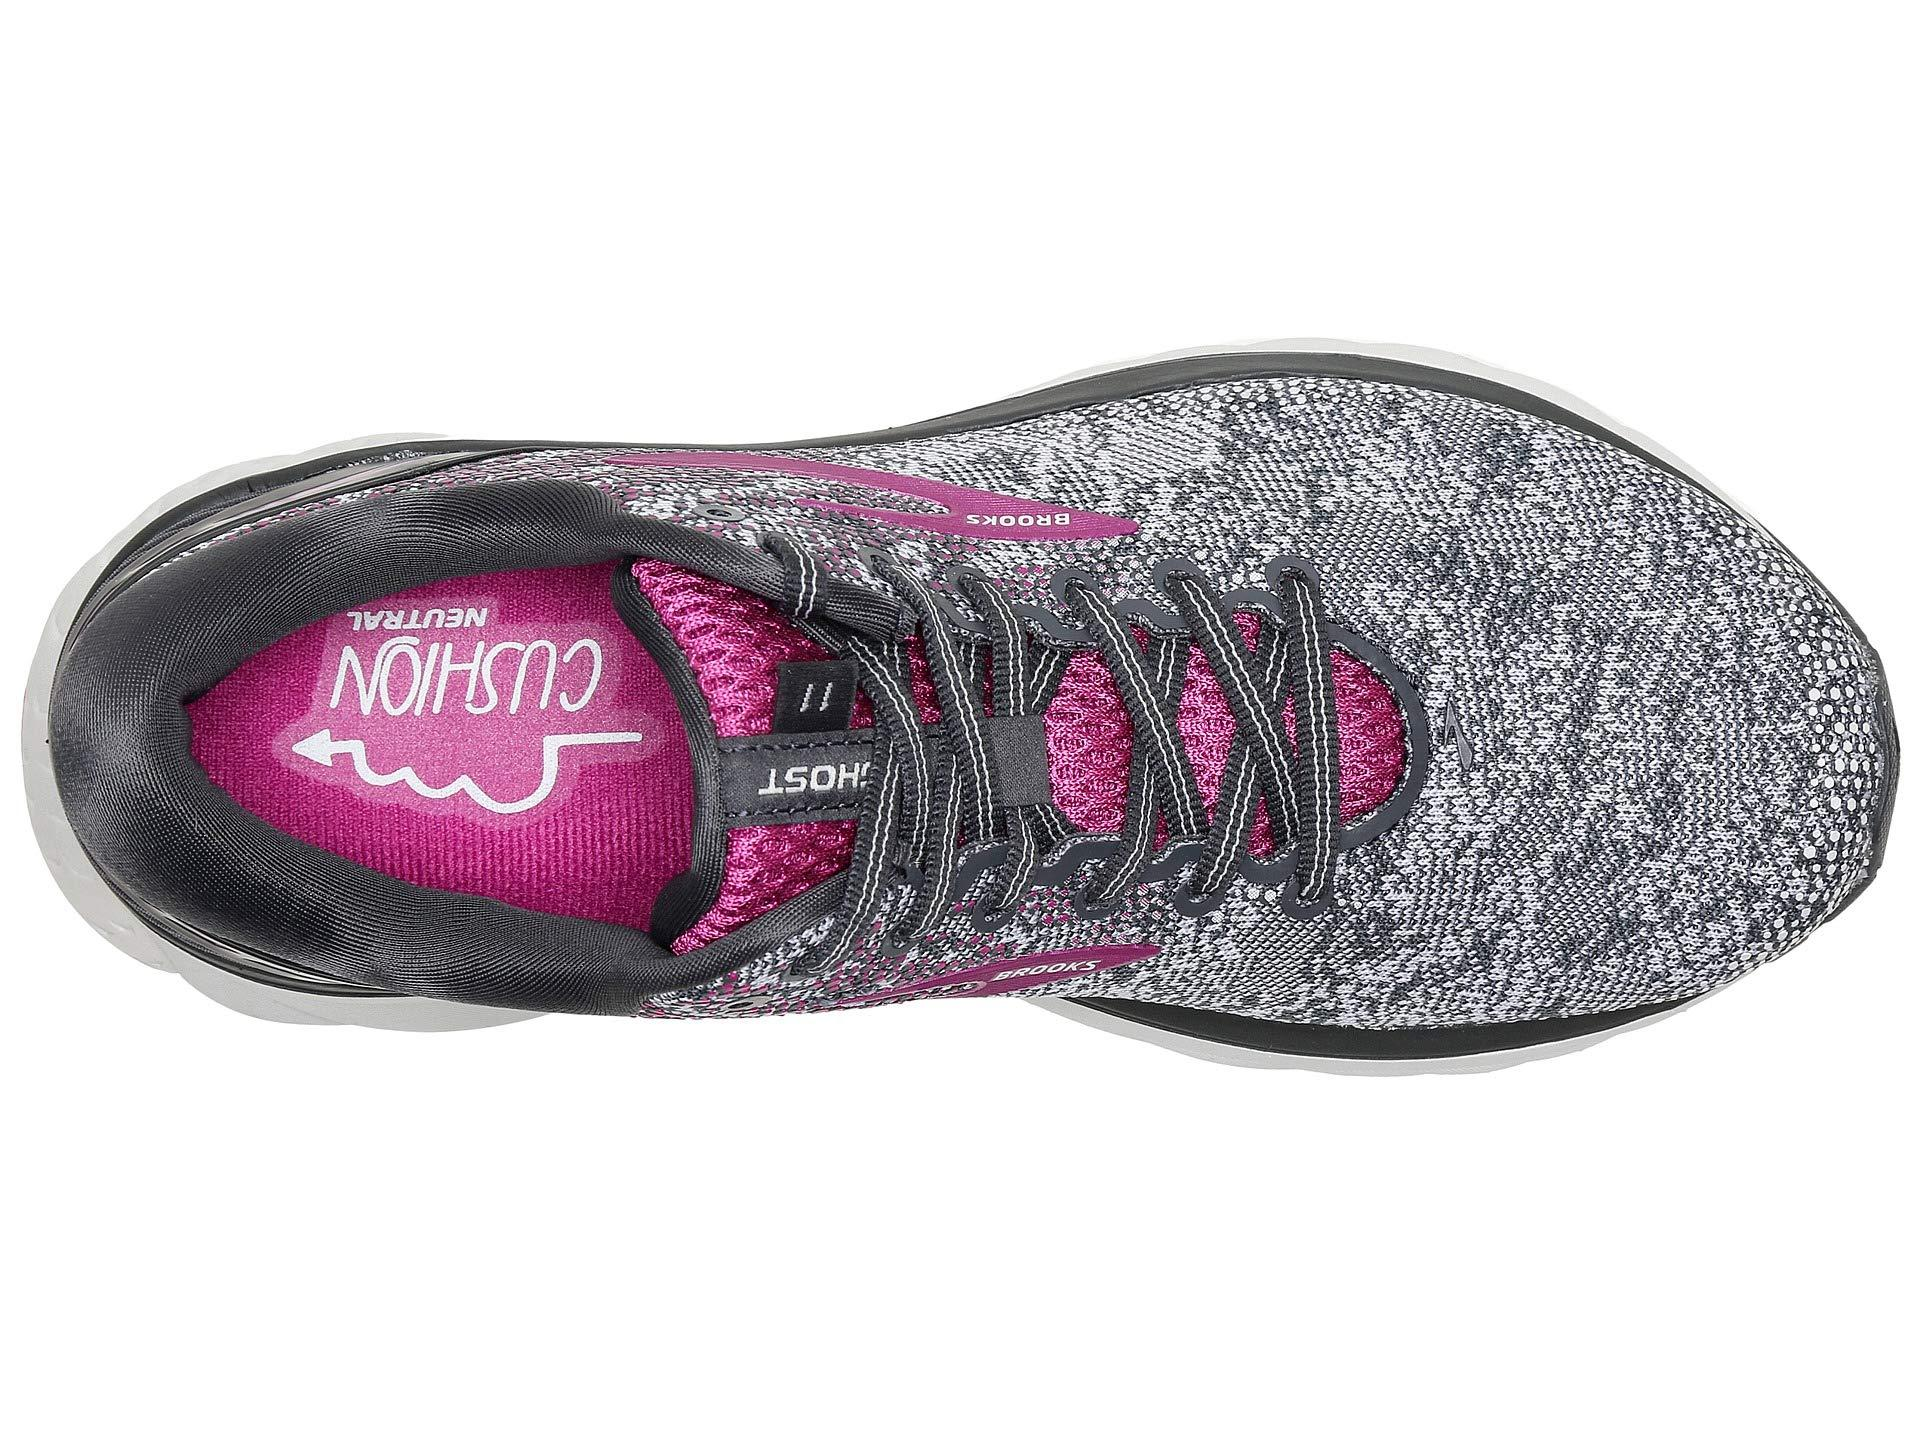 360f2ecec5c Brooks - Multicolor Ghost 11 (navy grey purple Rose) Women s Running Shoes.  View fullscreen